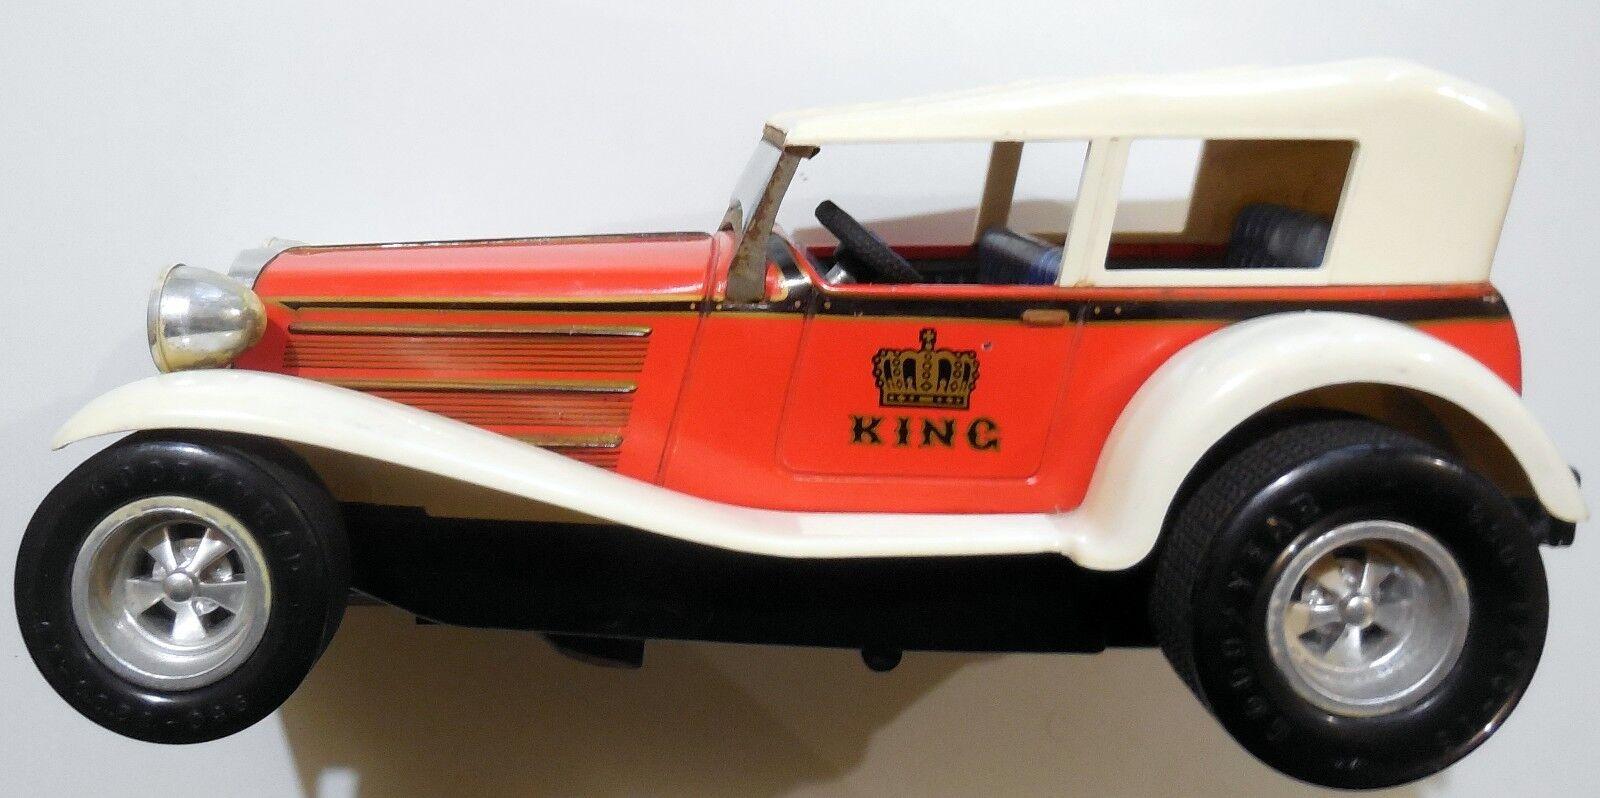 VINTAGE TOY AUTO CAR TAIYO MADE IN JAPAN KING KING SPEED 1931 SERIES 1970s